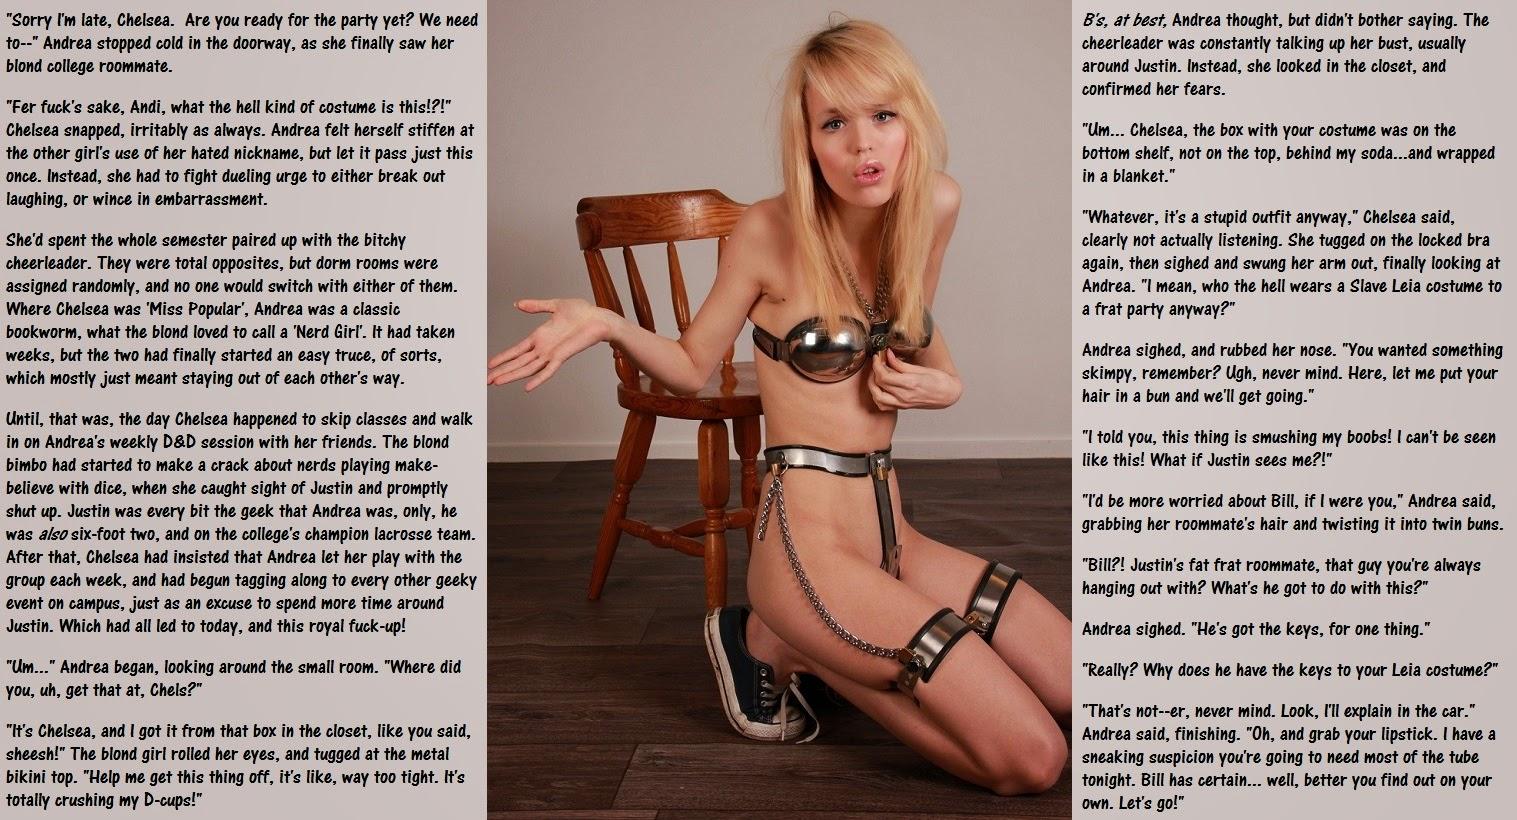 Permanent Chastity